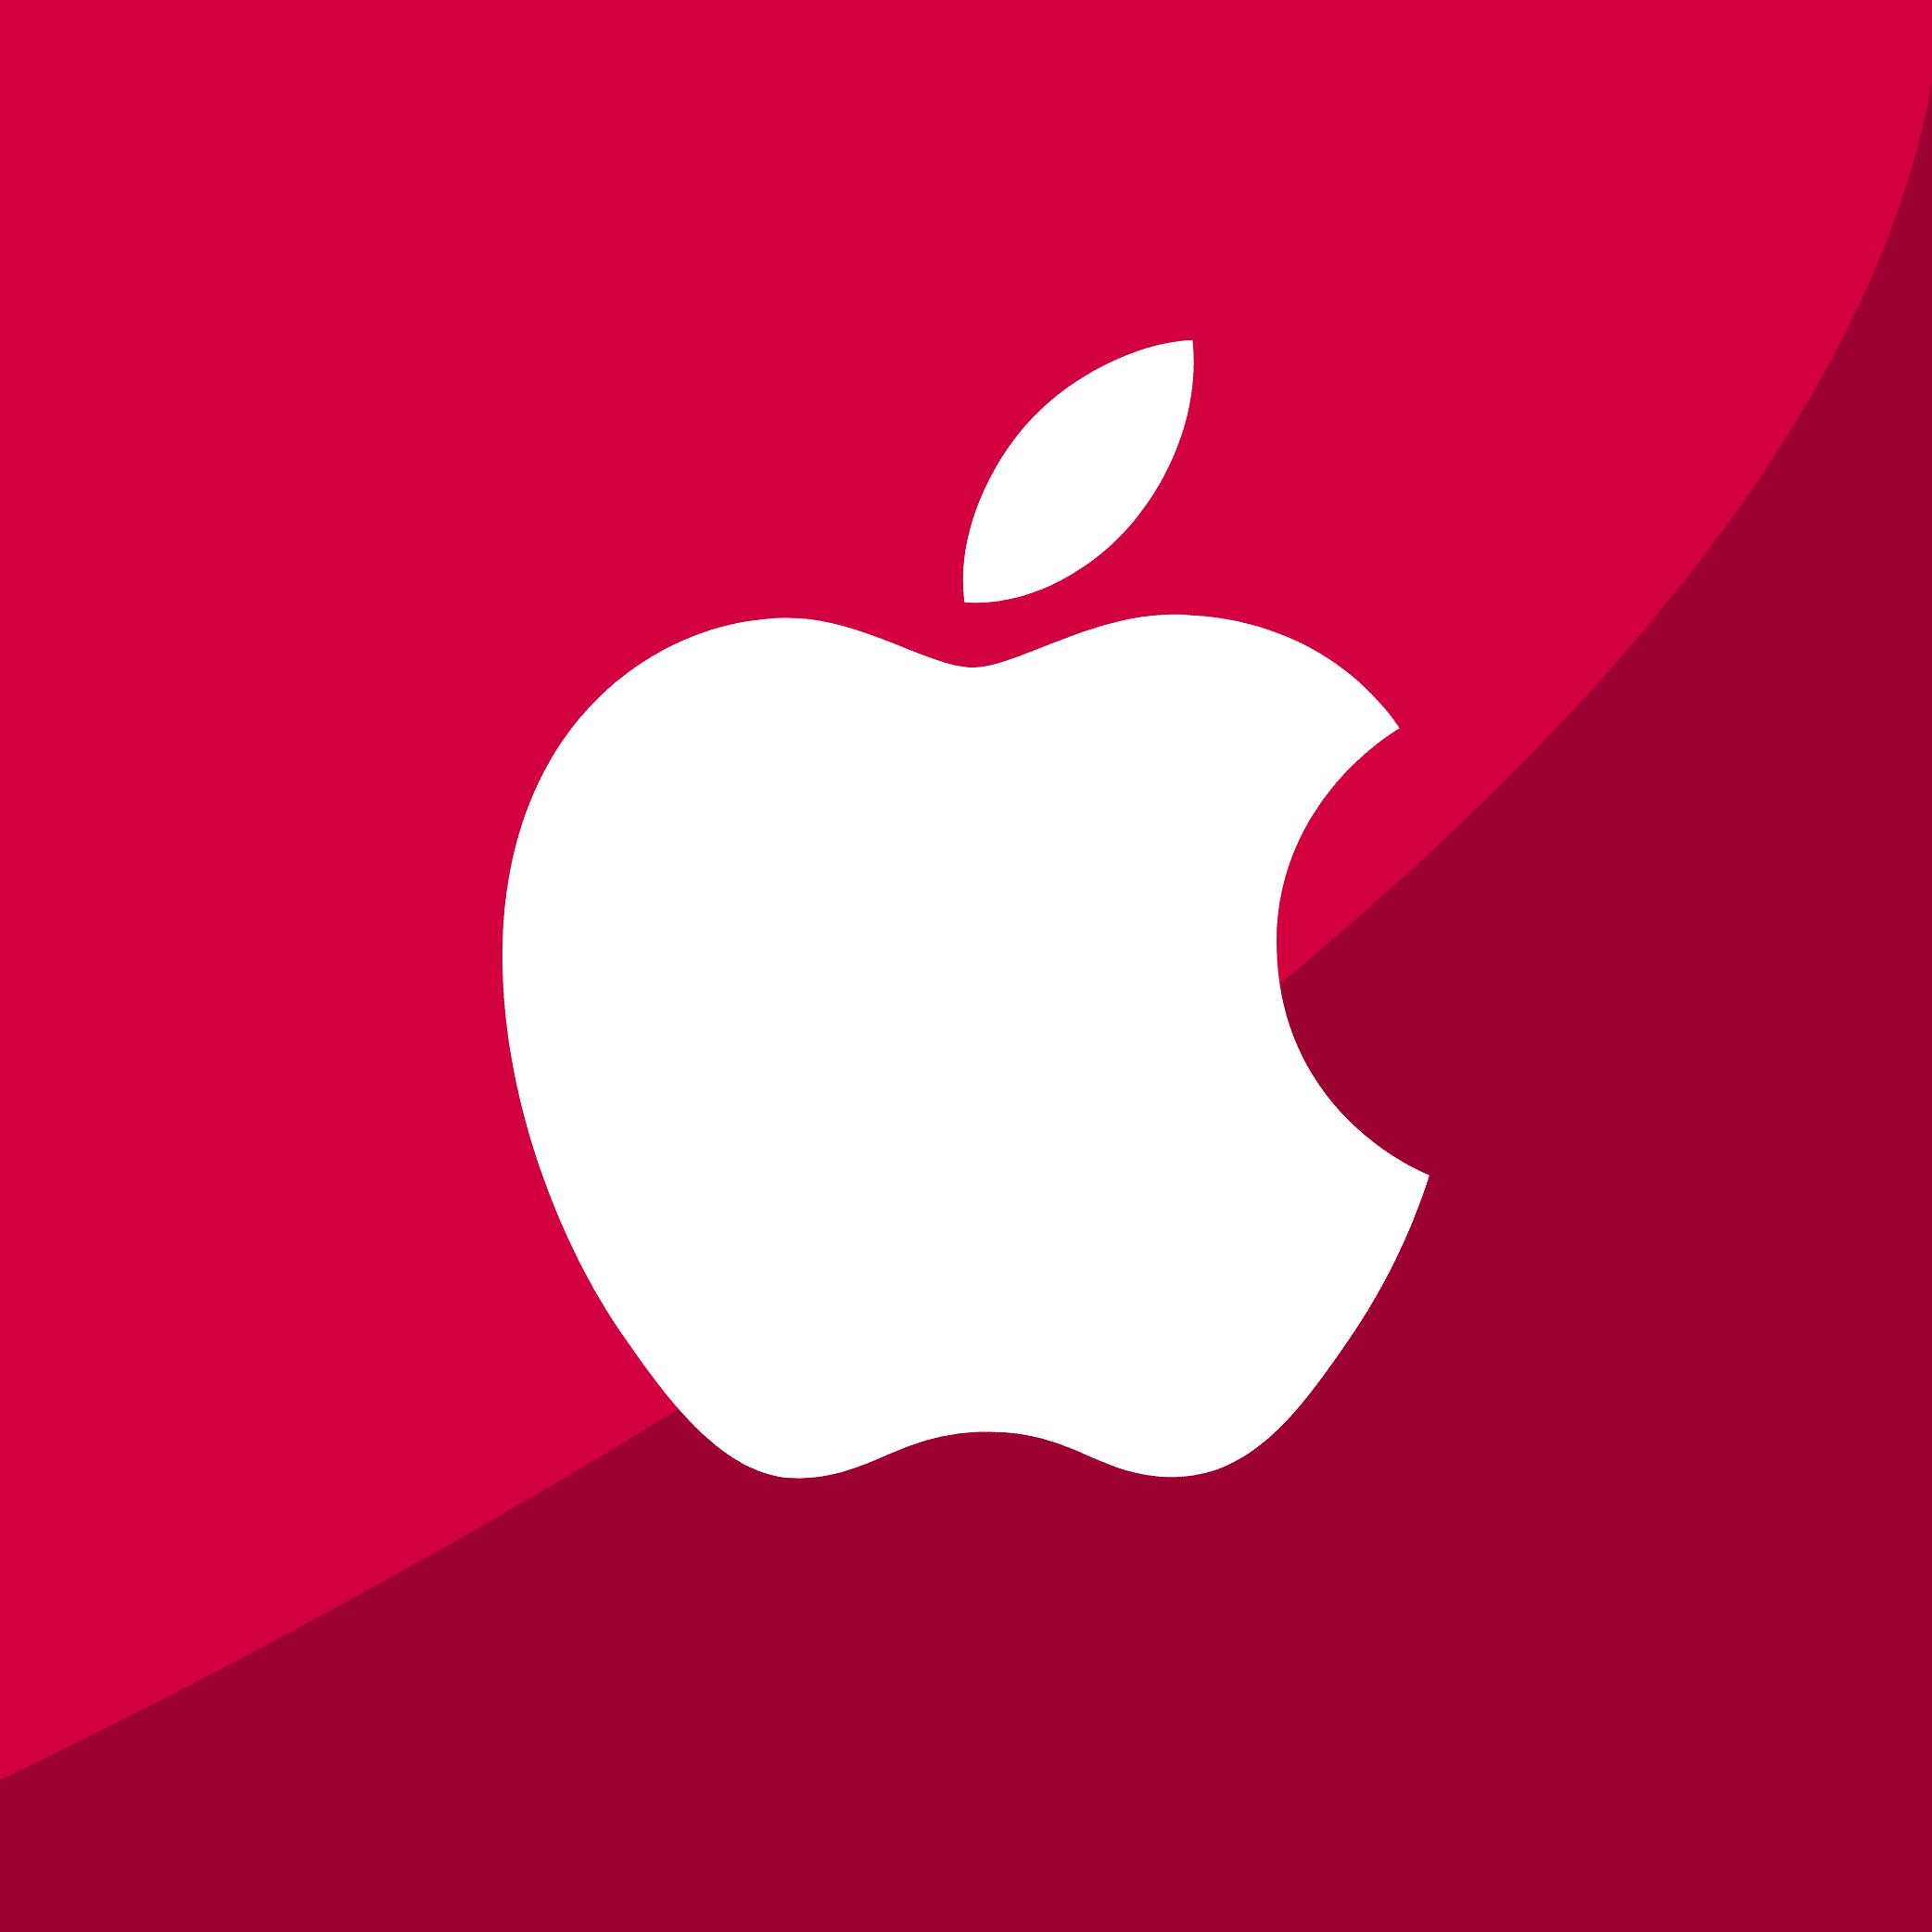 Audio Interface Mac Apple